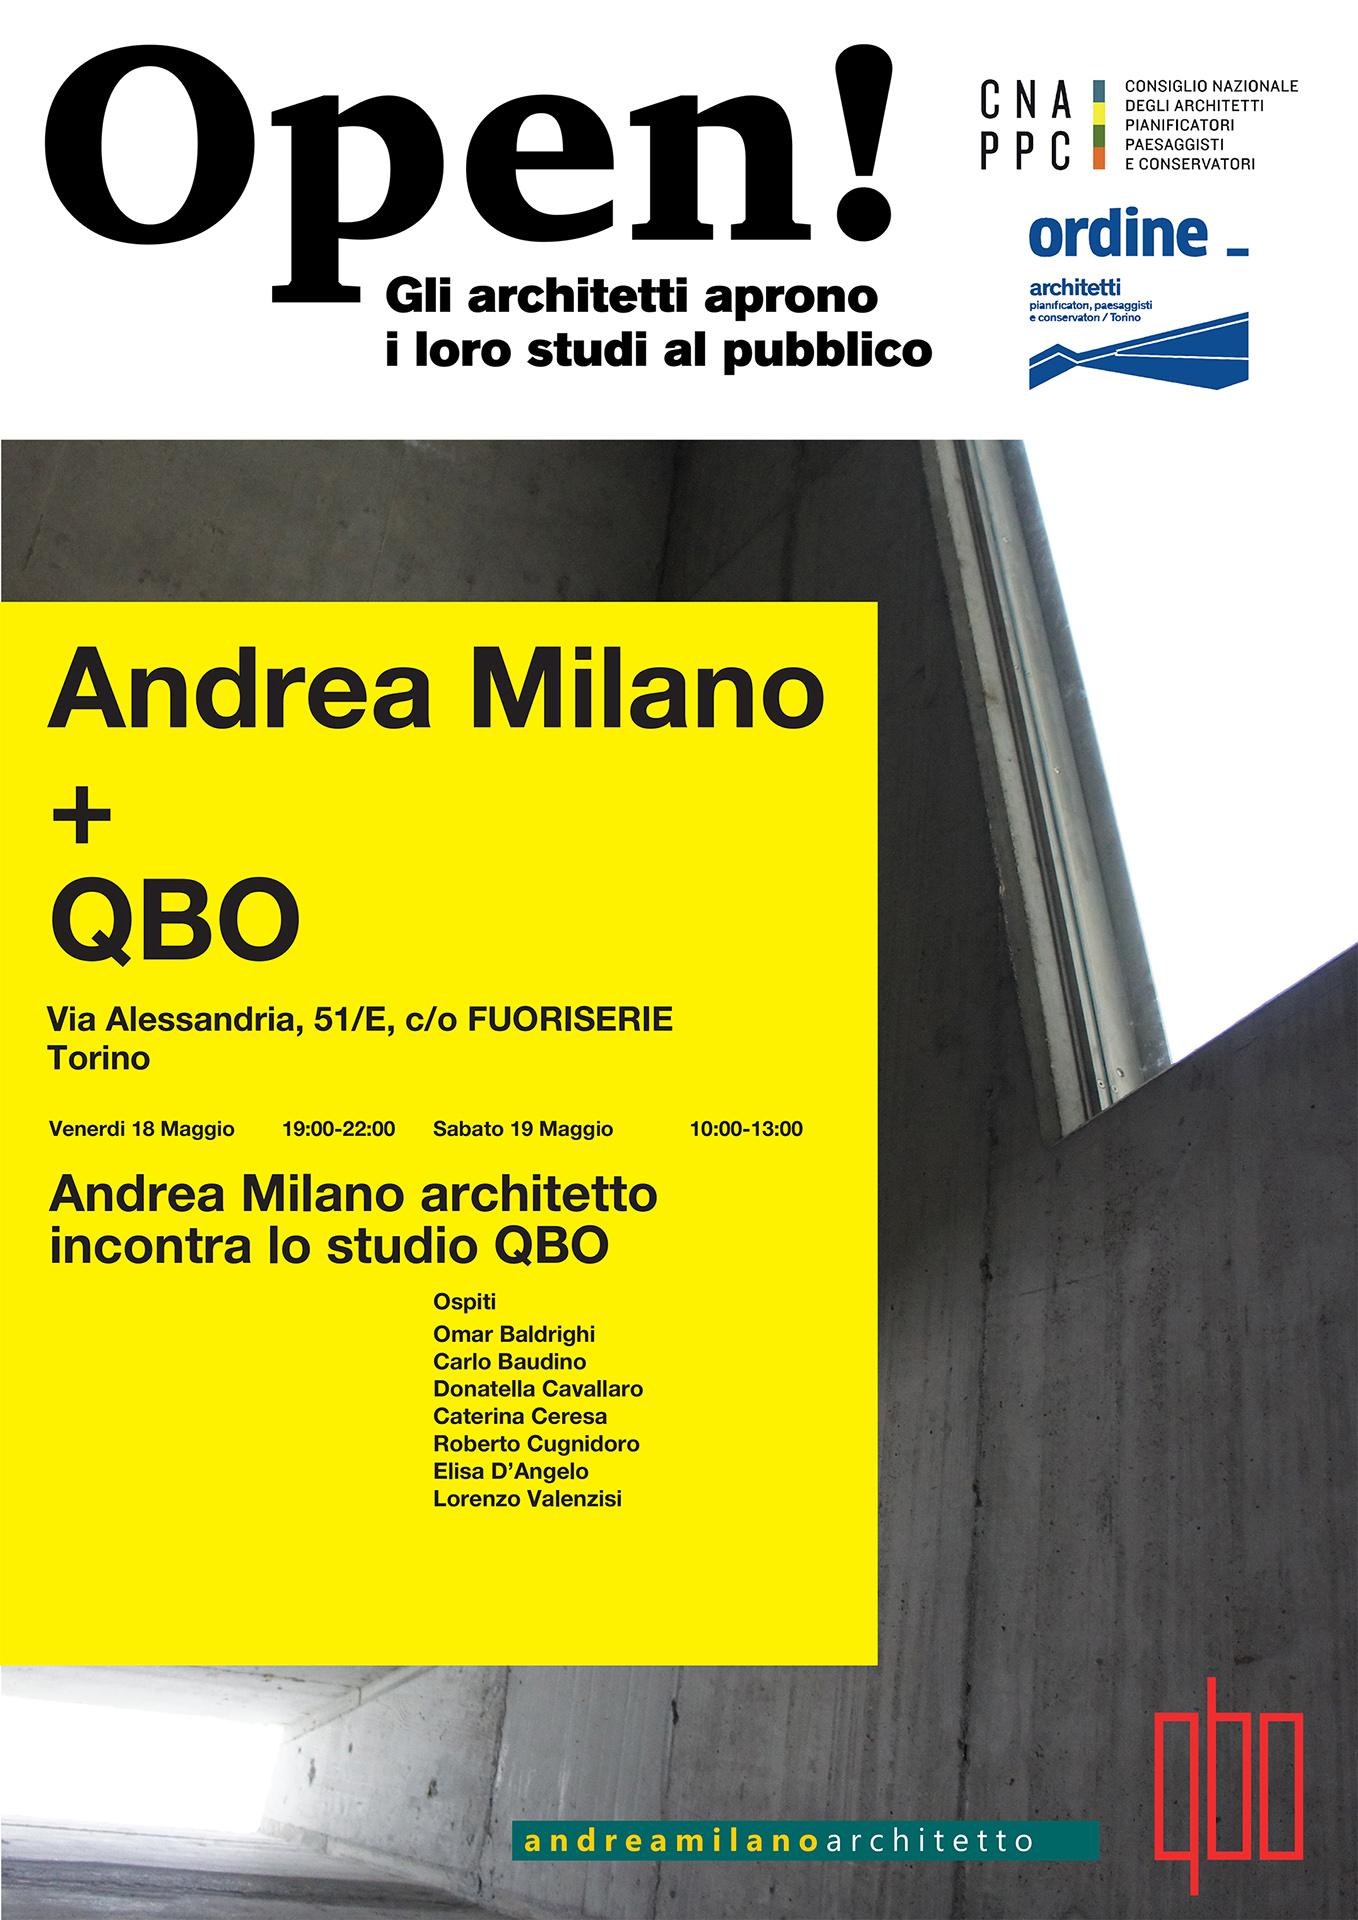 andreamilano+QBO_open